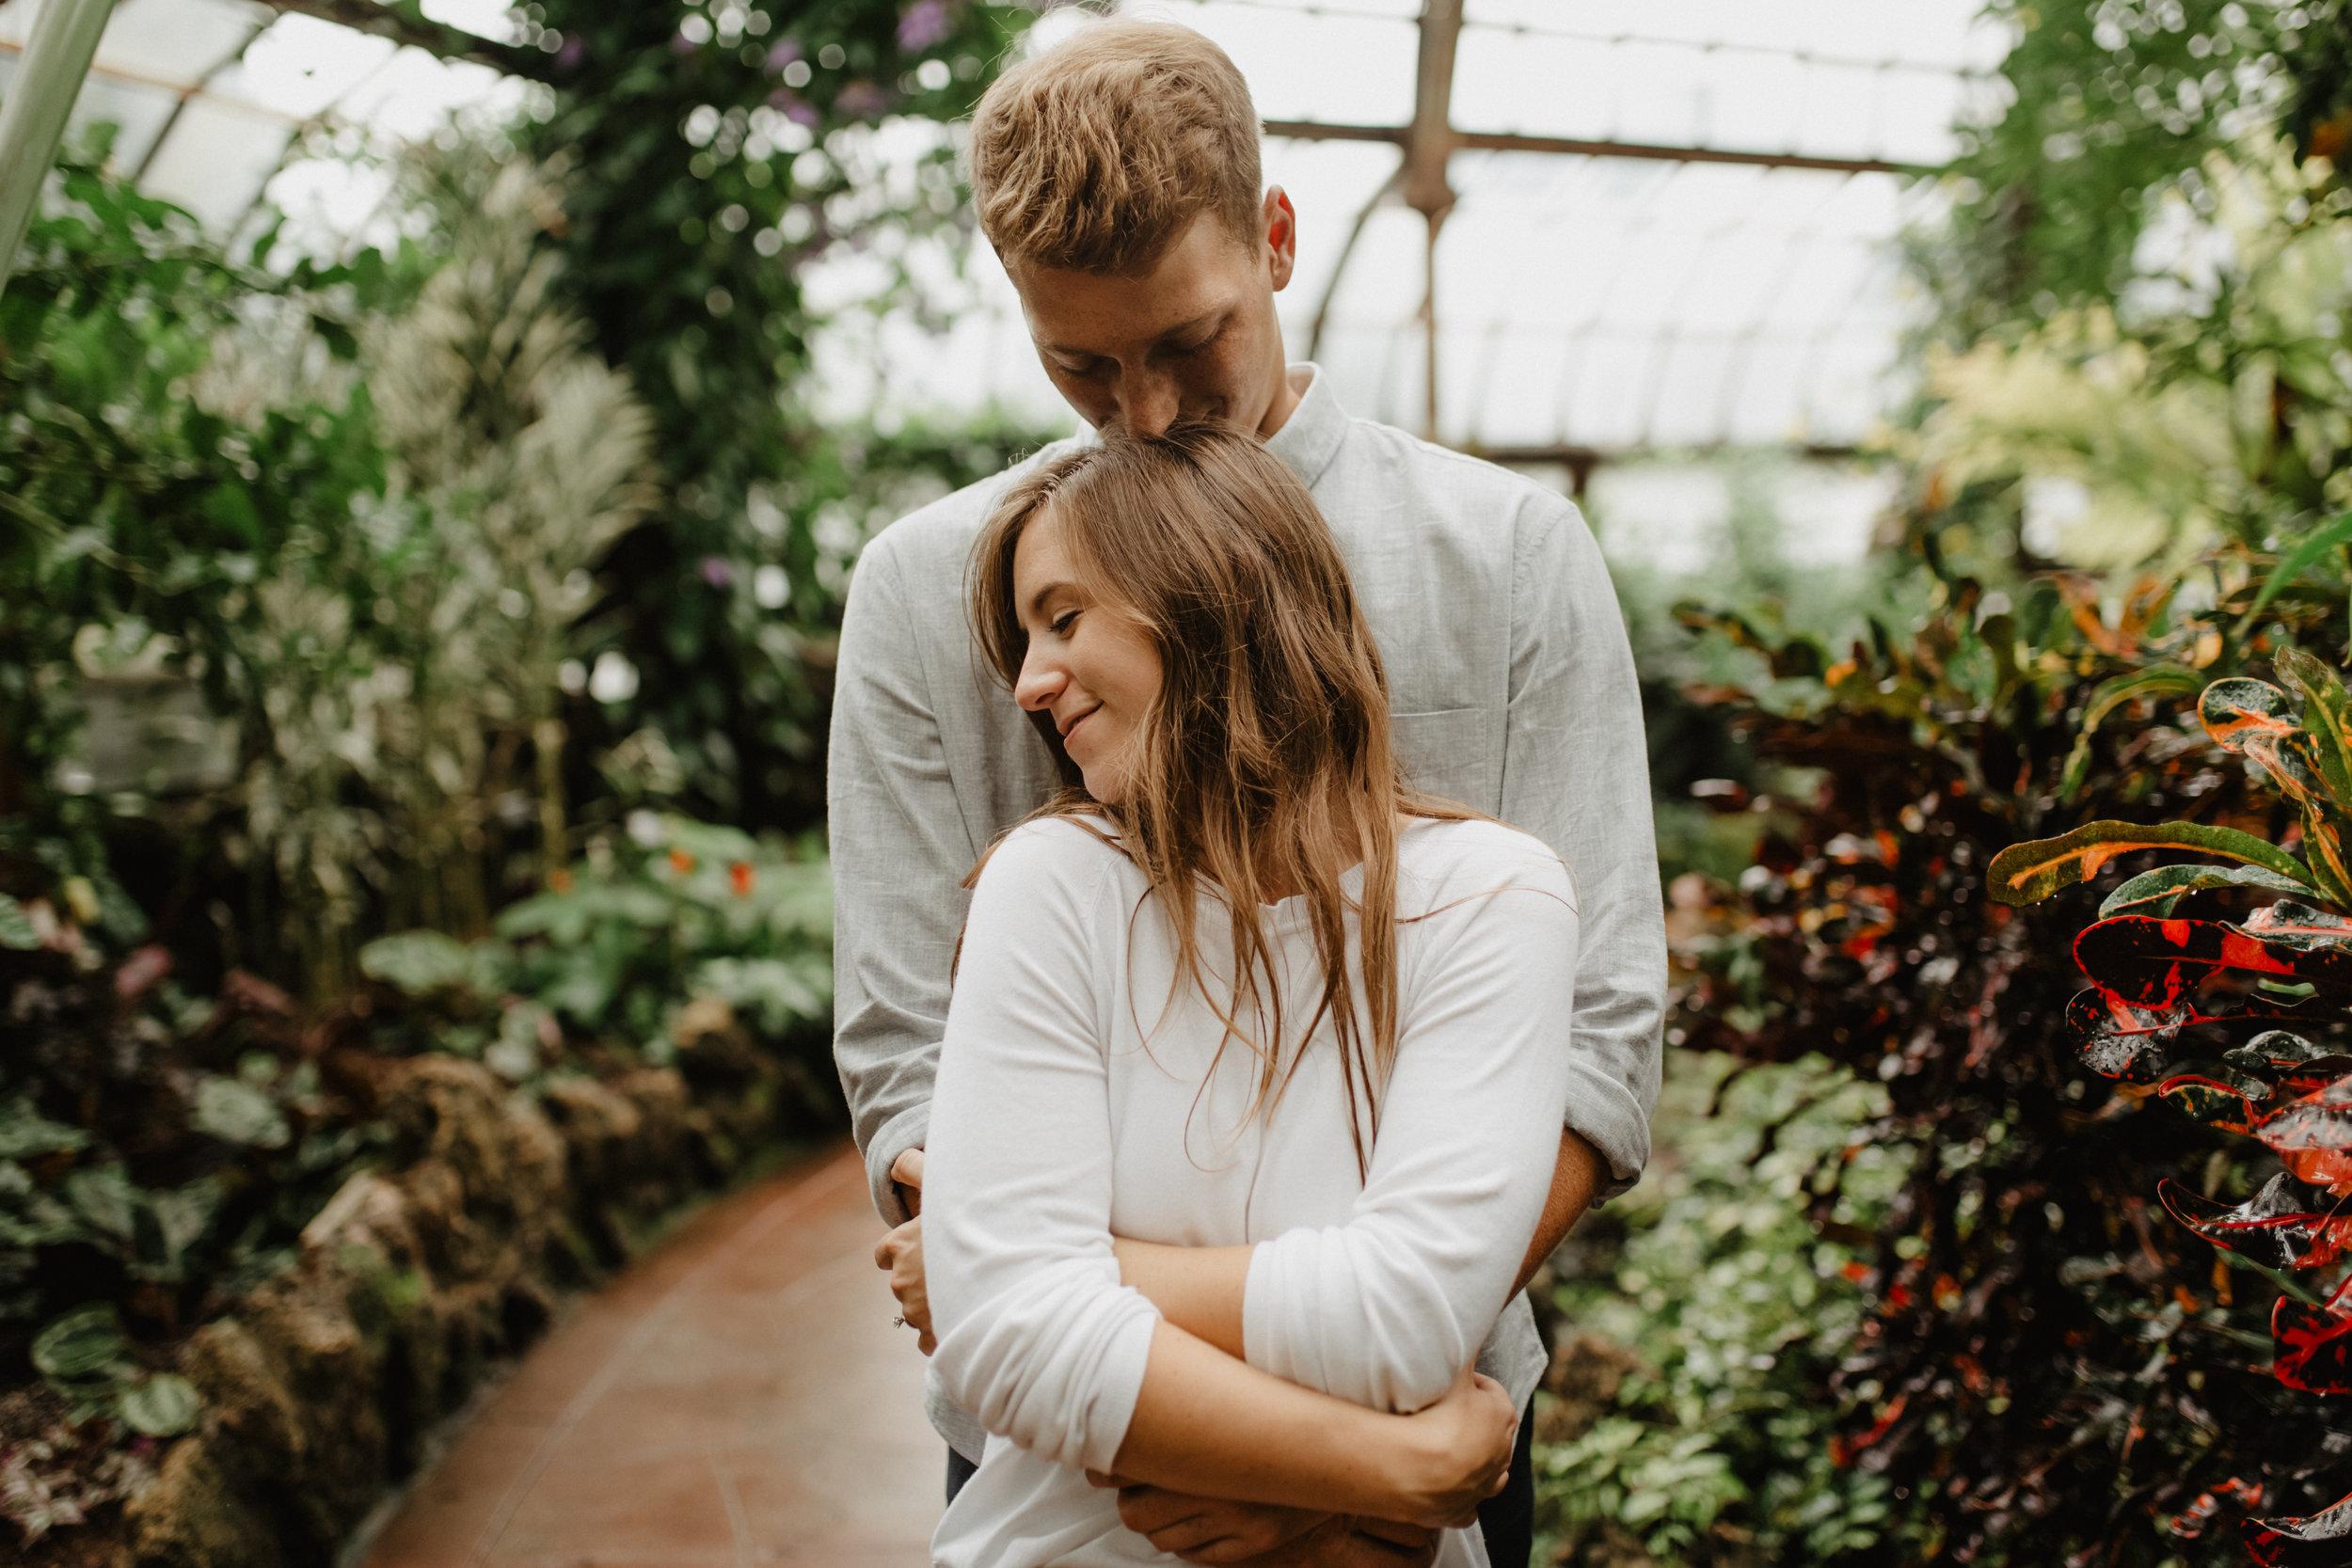 Taryn-Zak-Lincoln-Park-Conservatory-Engagement-22